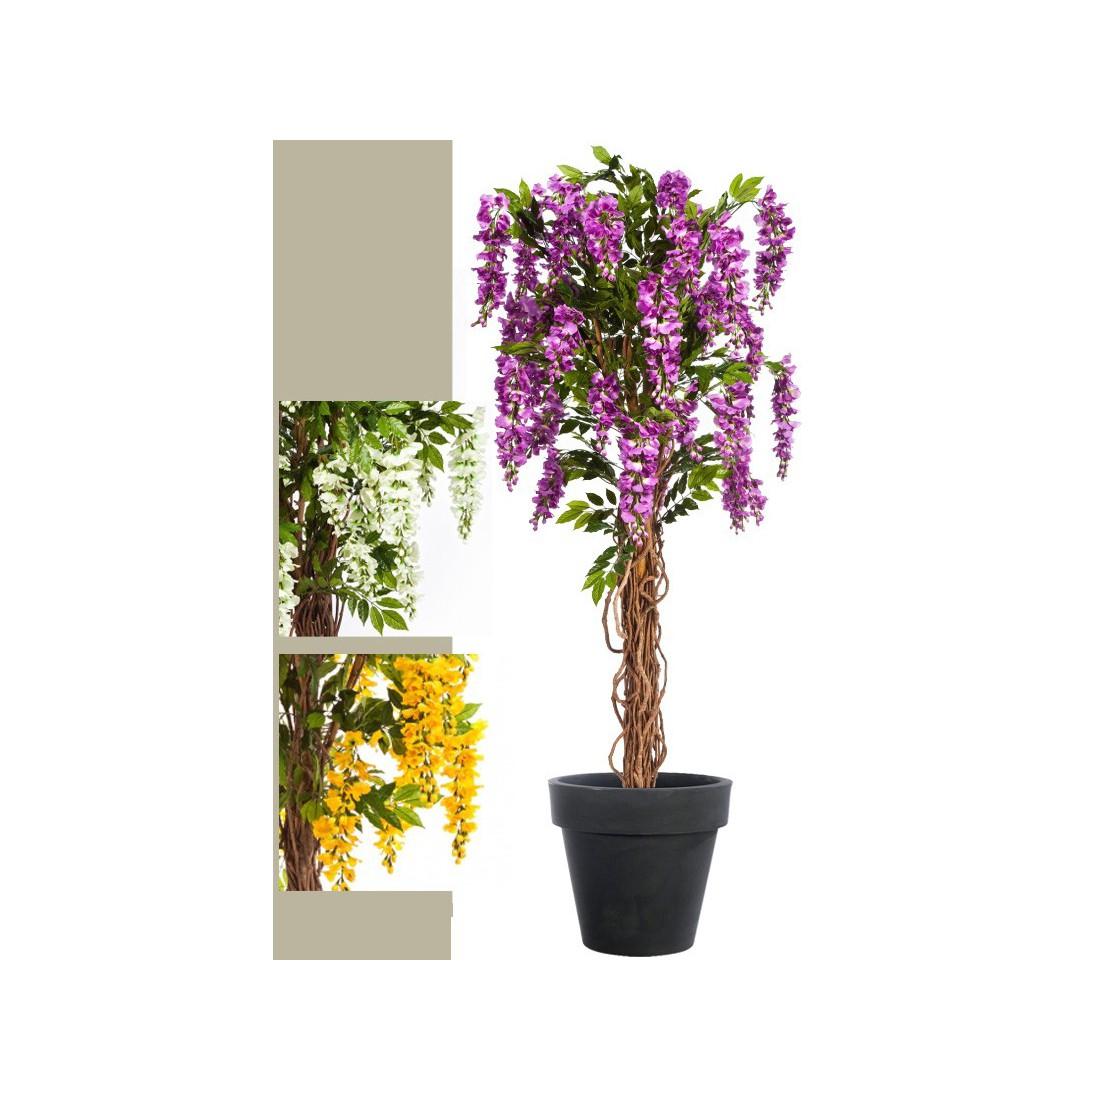 glycine artificielle 180 cm arbres fleuris reflets nature lyon. Black Bedroom Furniture Sets. Home Design Ideas